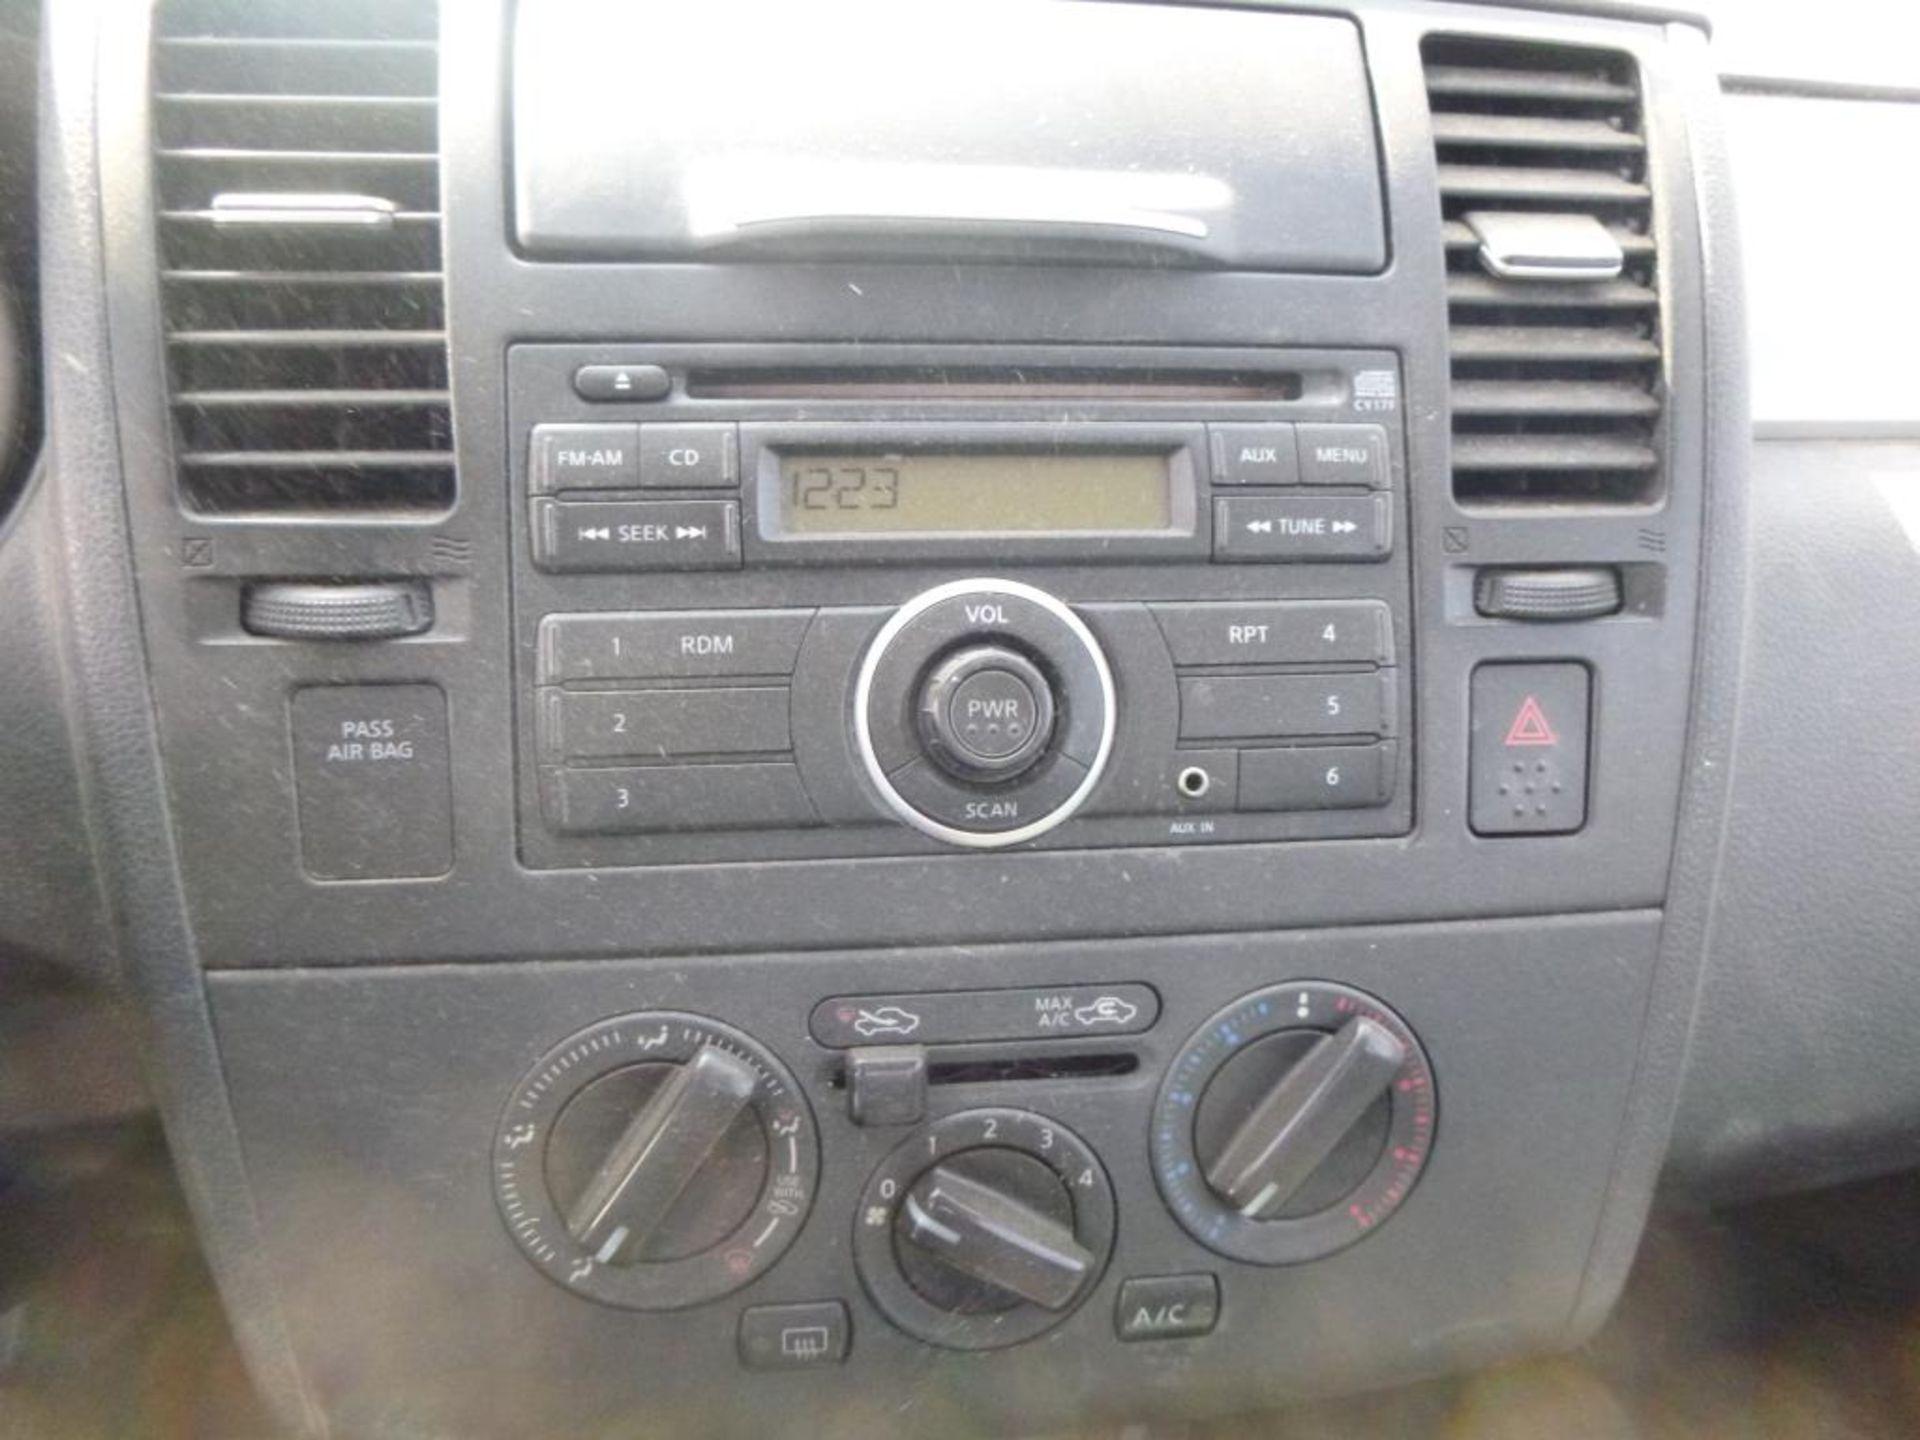 2010 Nissan Versa - Image 12 of 13